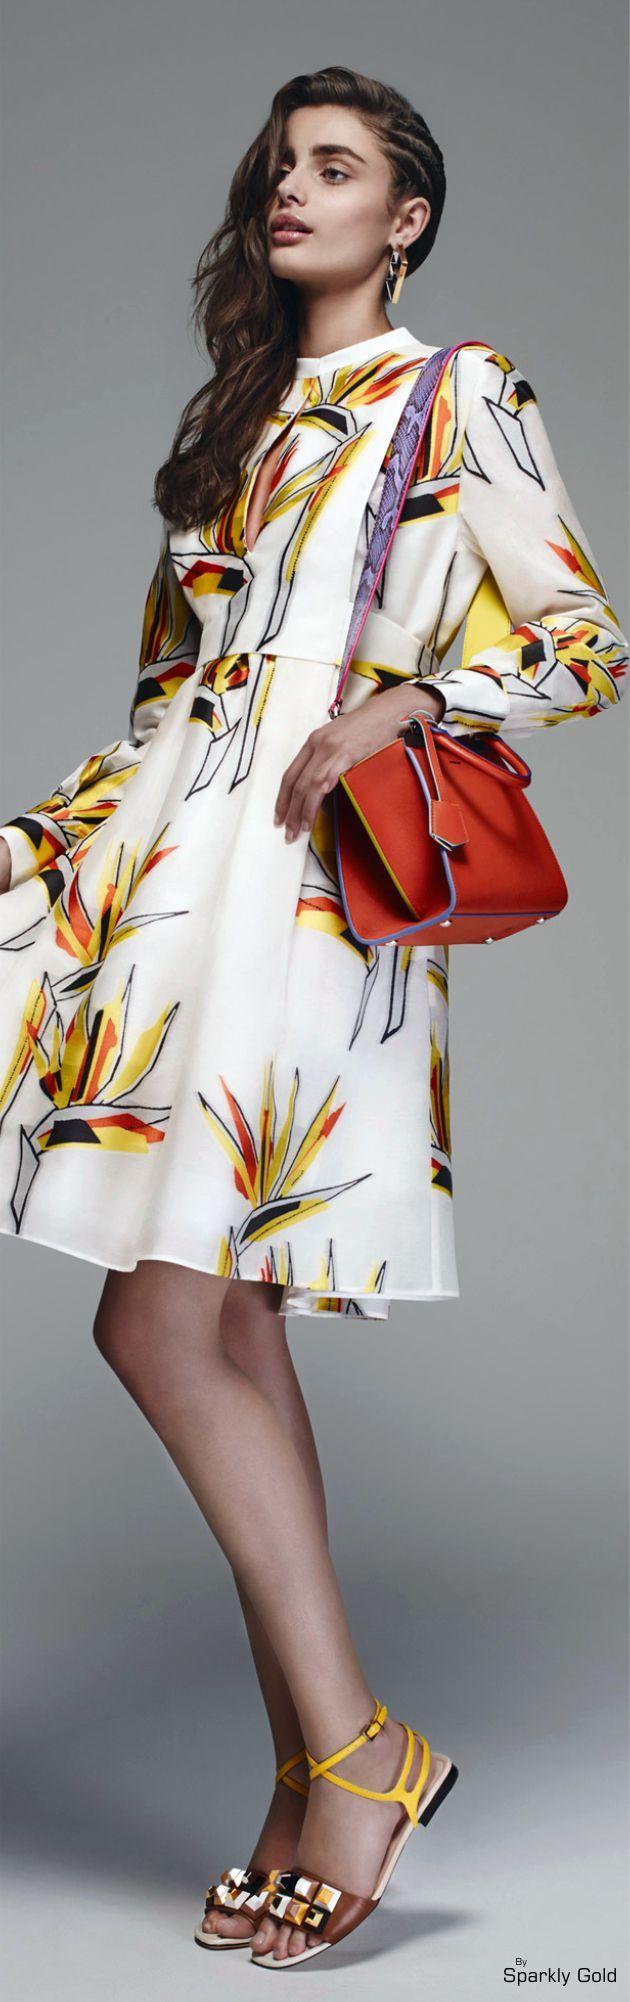 Fendi Resort 2016. Long sleeve floral print dress. take a red bag, wear the sandals,enjoy the sunshine.